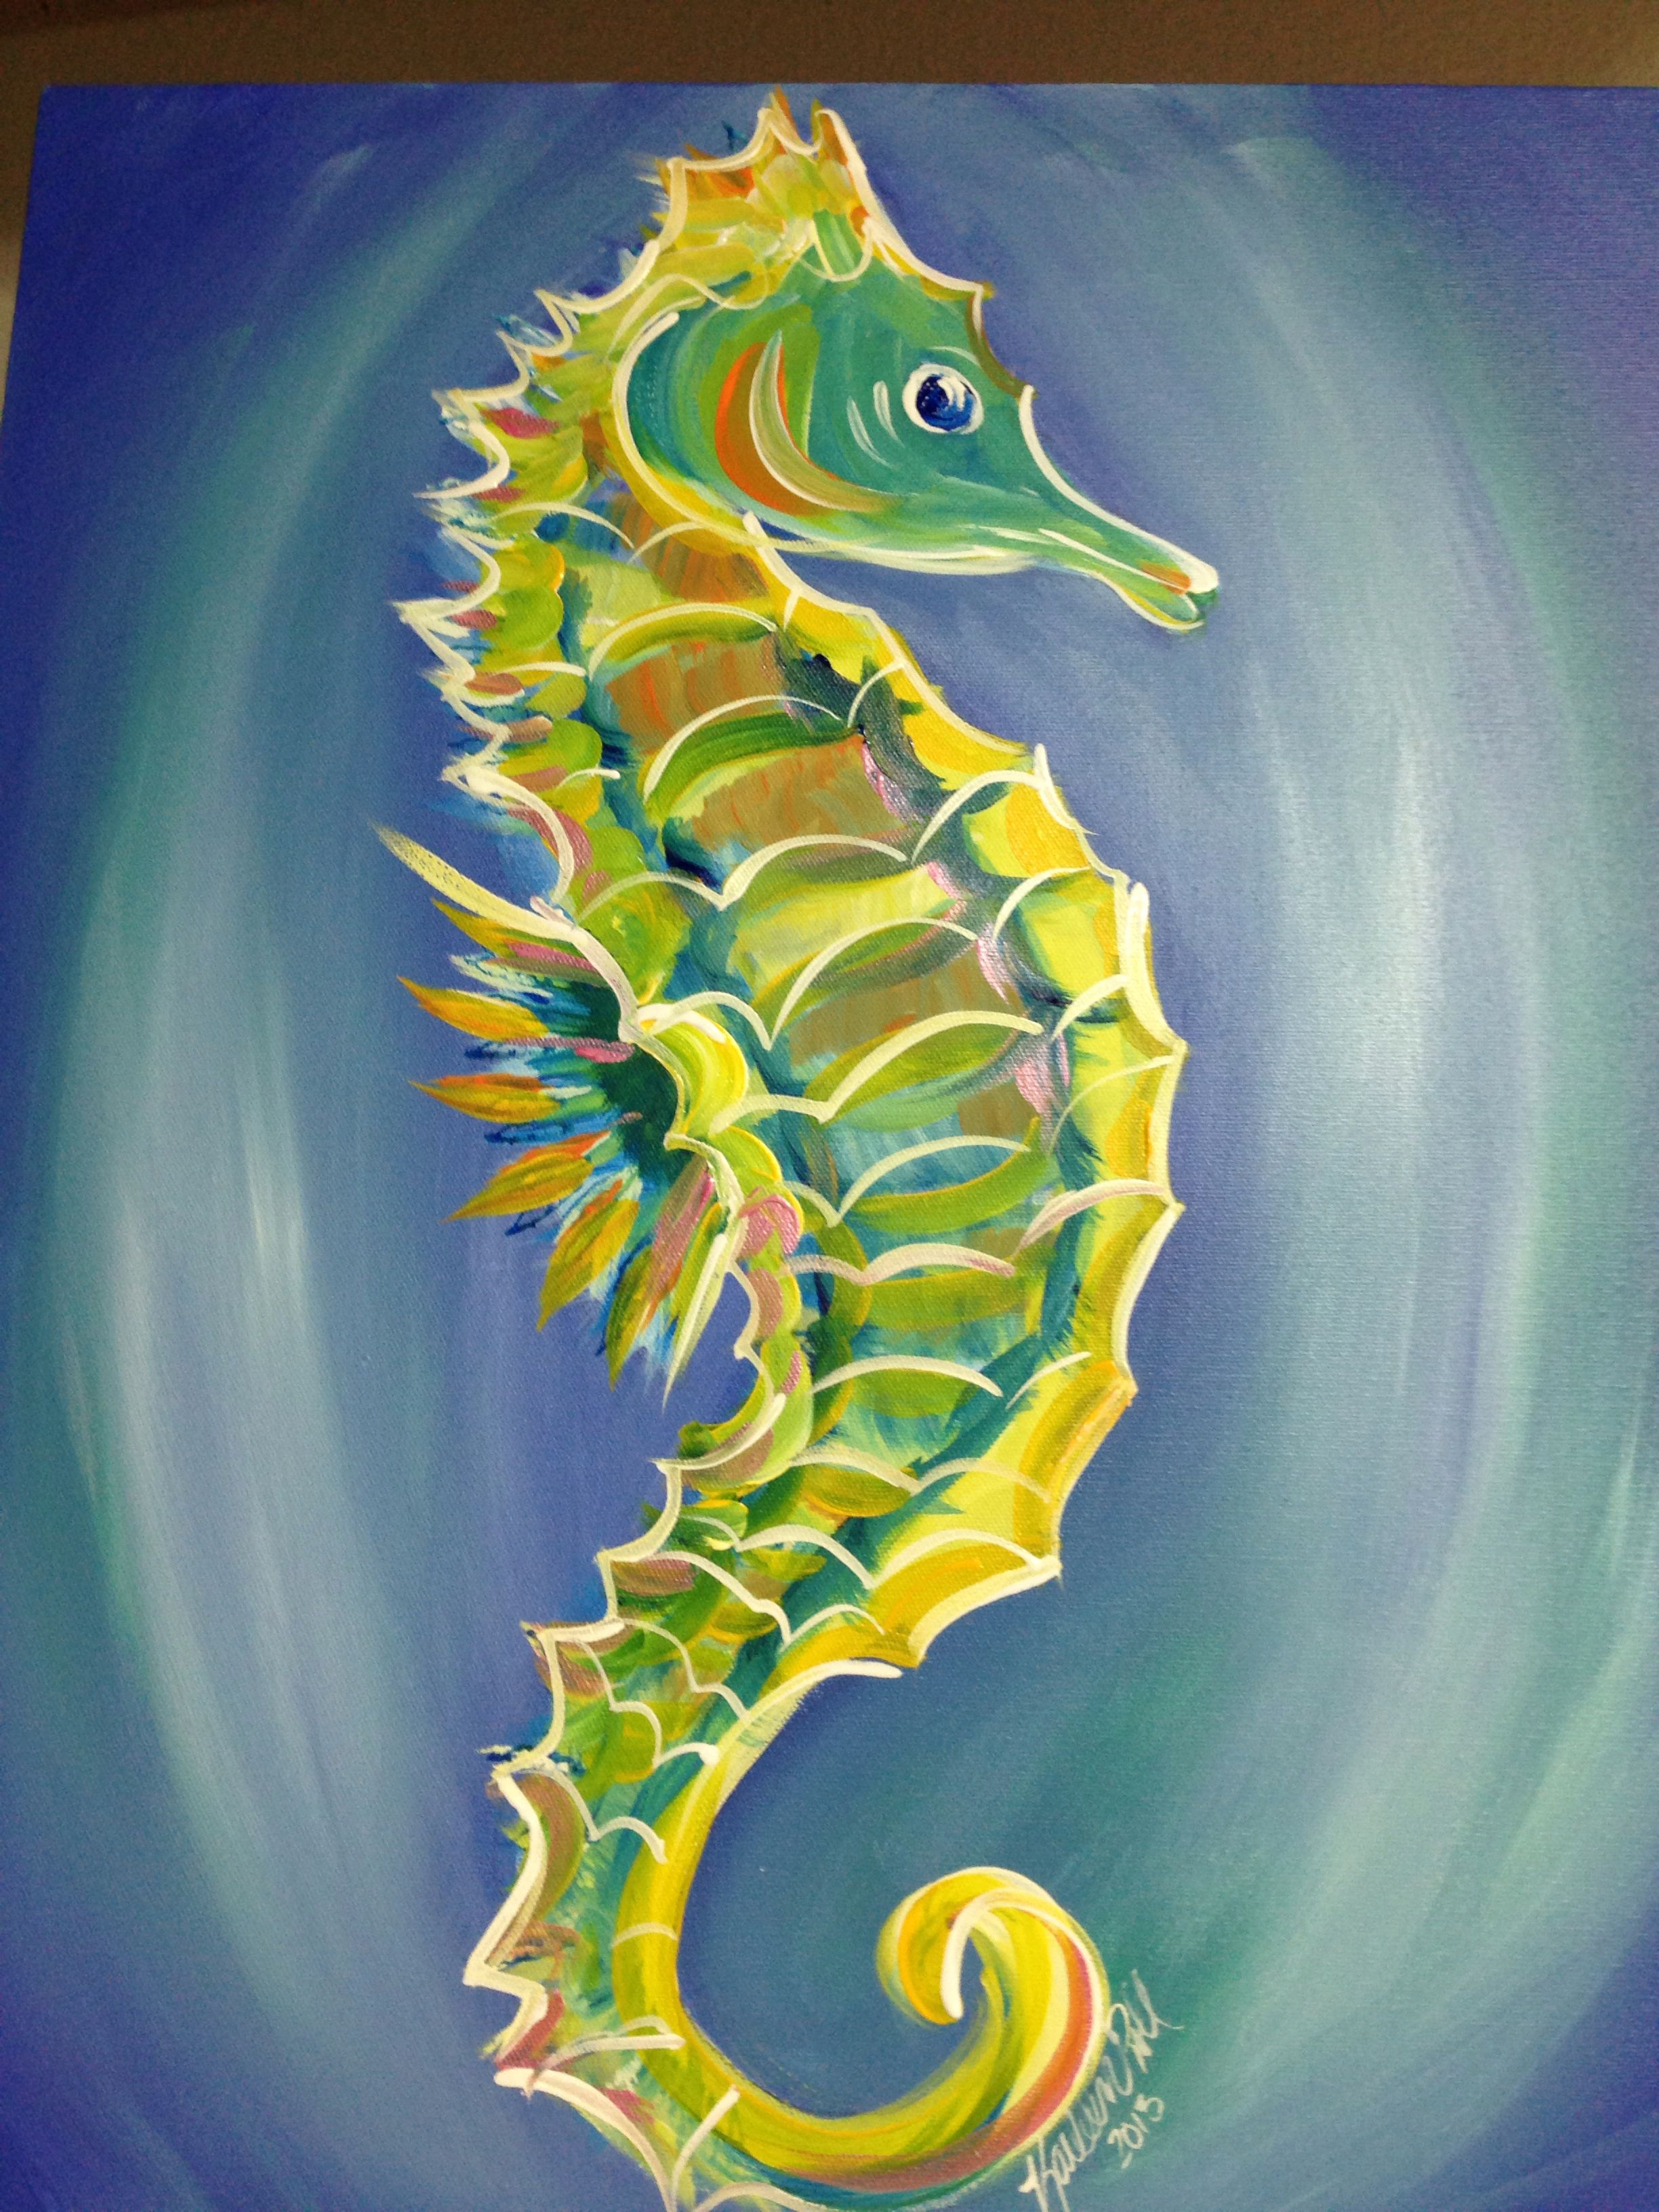 2013 acrylic seahorse | My Art | Pinterest | Seahorses, Acrylics and ...